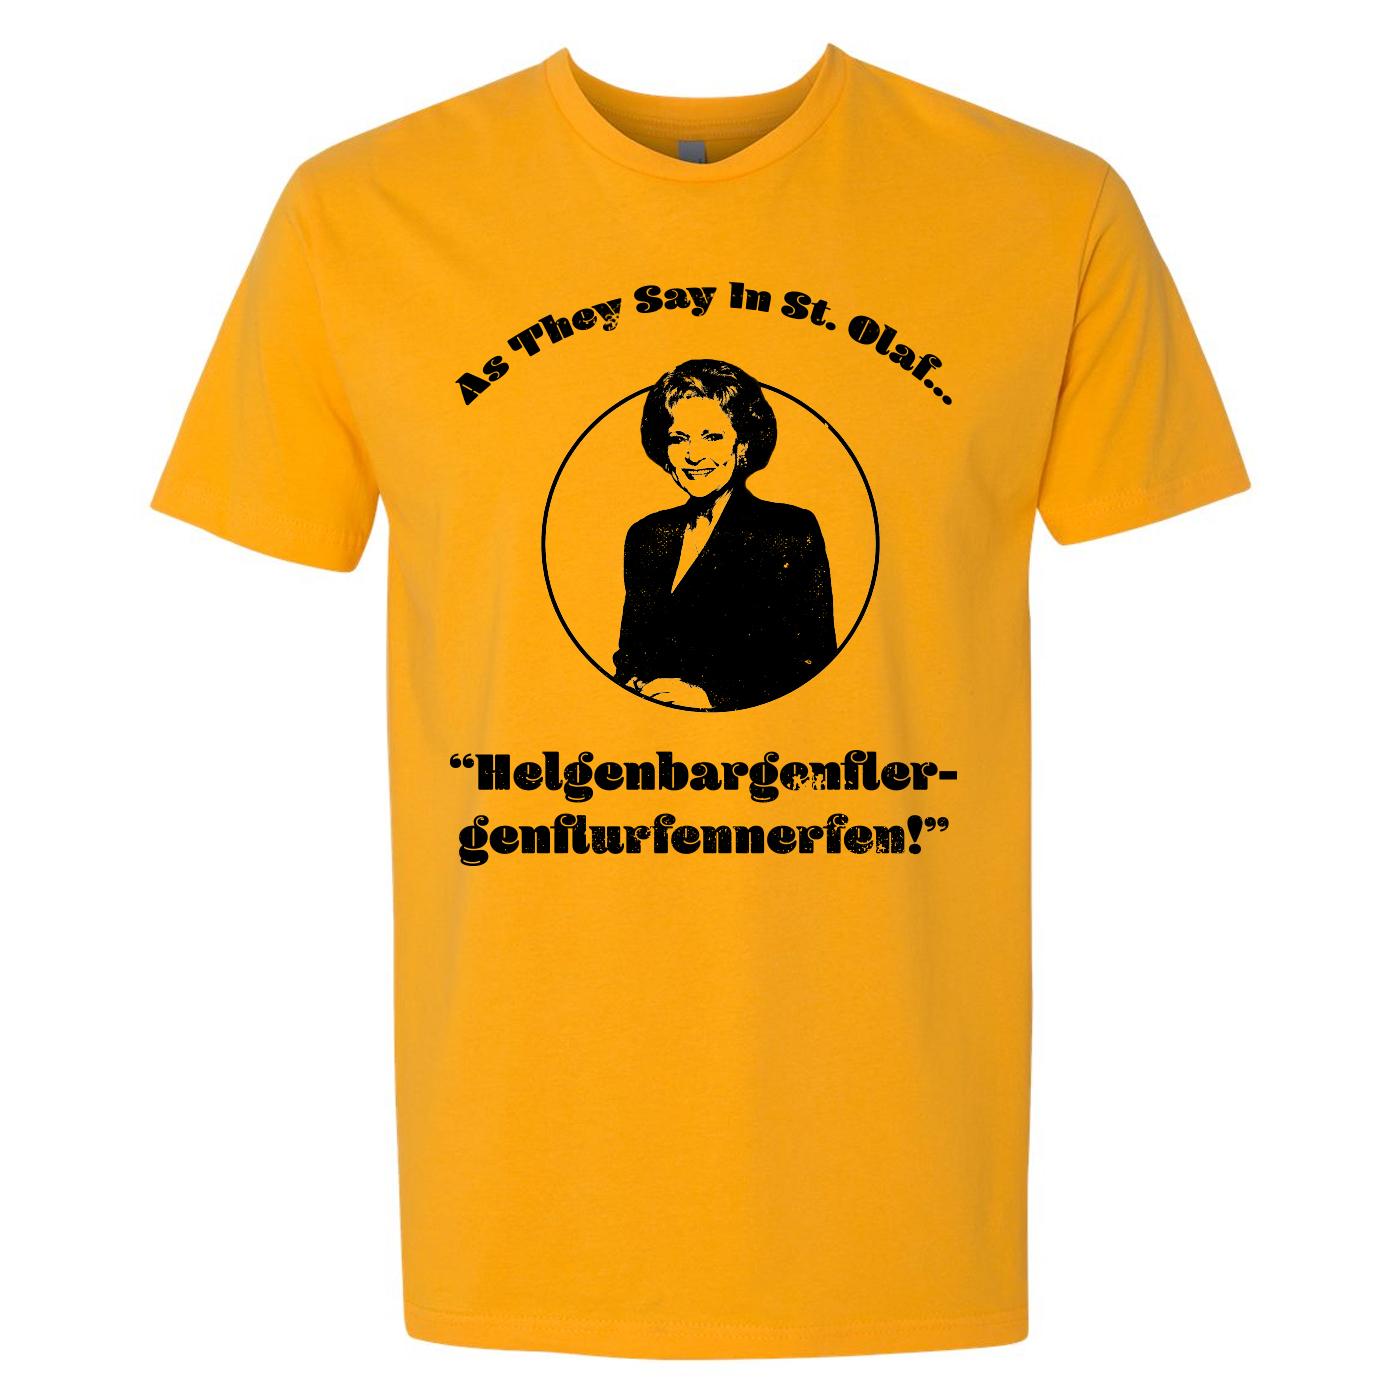 The Golden Girls St. Olaf T-Shirt